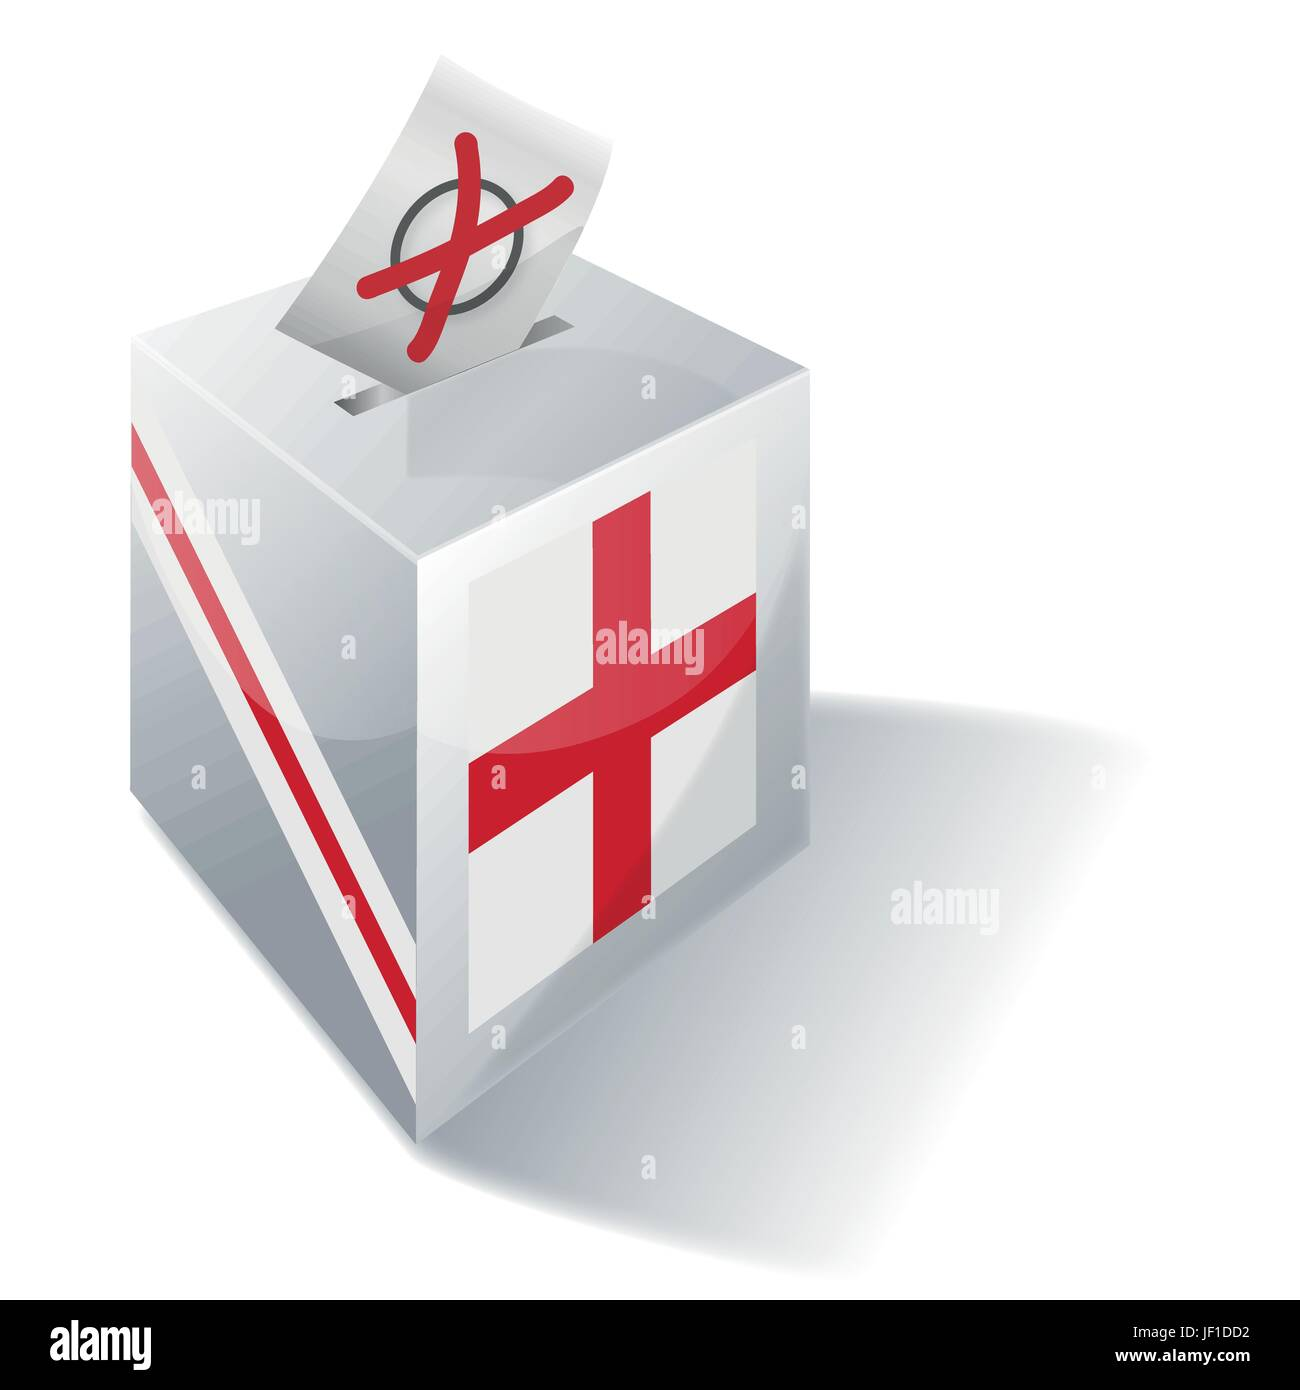 cross, england, knight, kingdom, unites, english, britain, social, cross, urns, - Stock Image